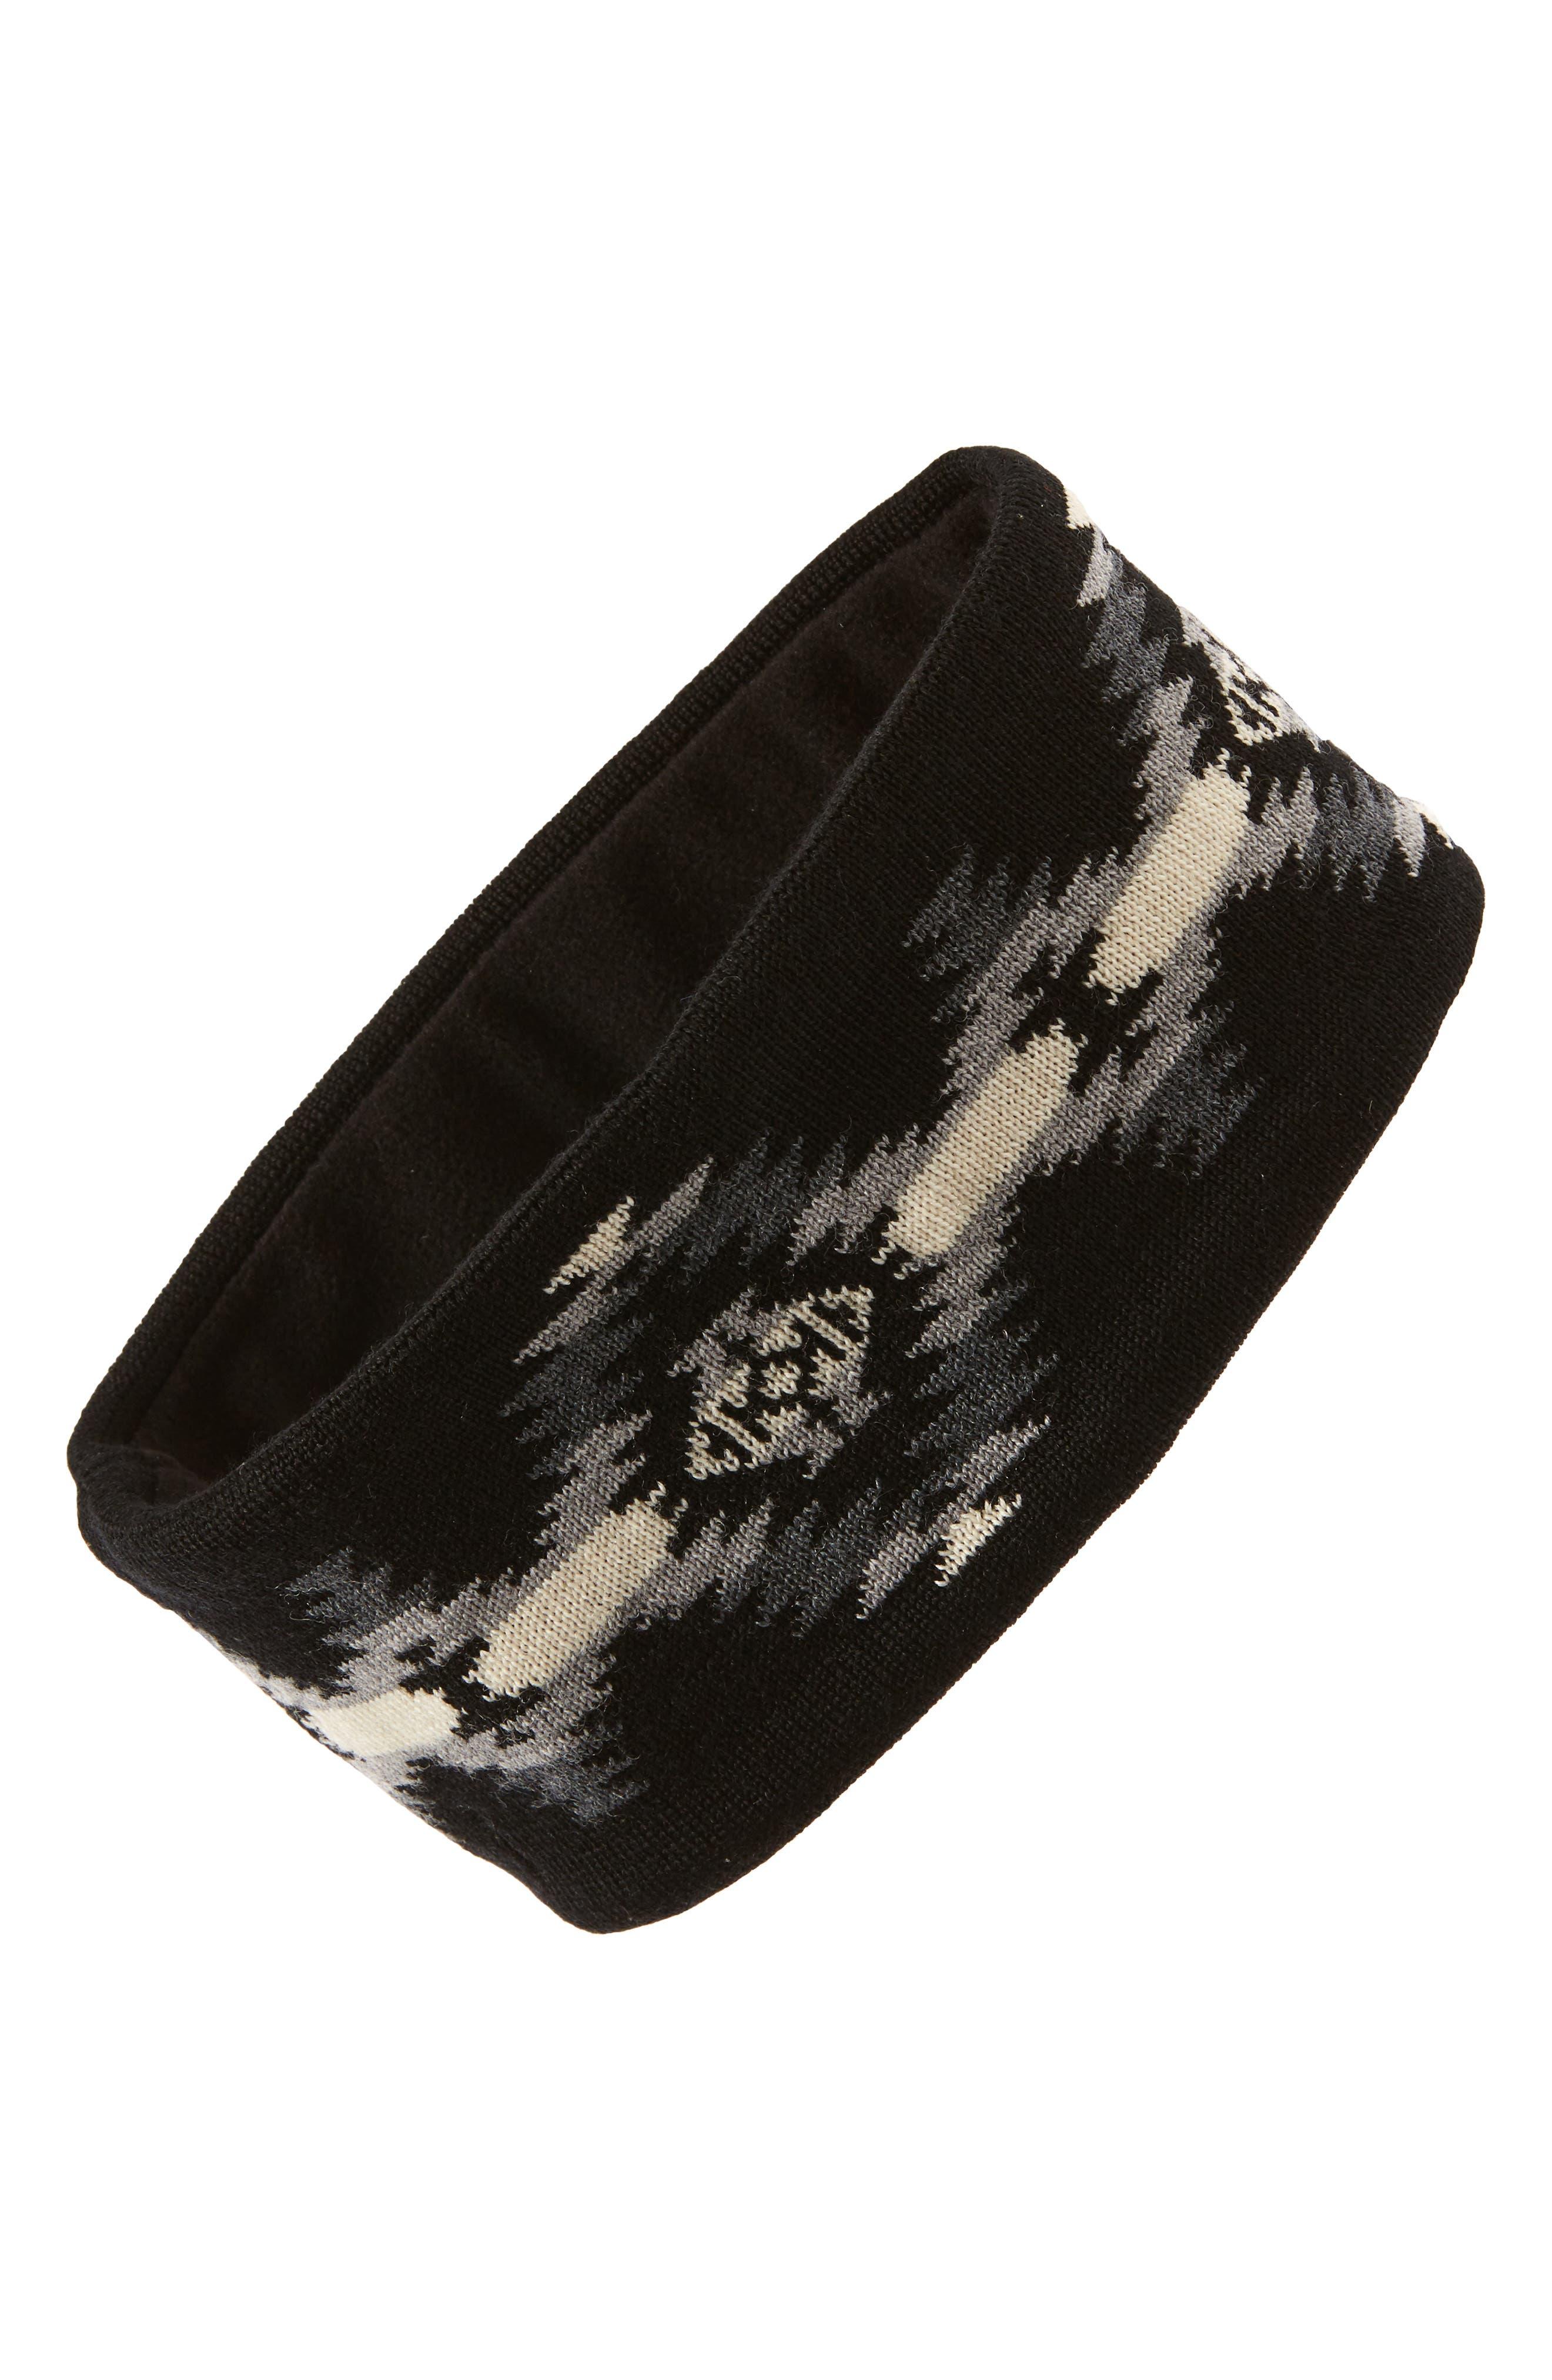 Alternate Image 1 Selected - Pendleton Fleece Lined Headband